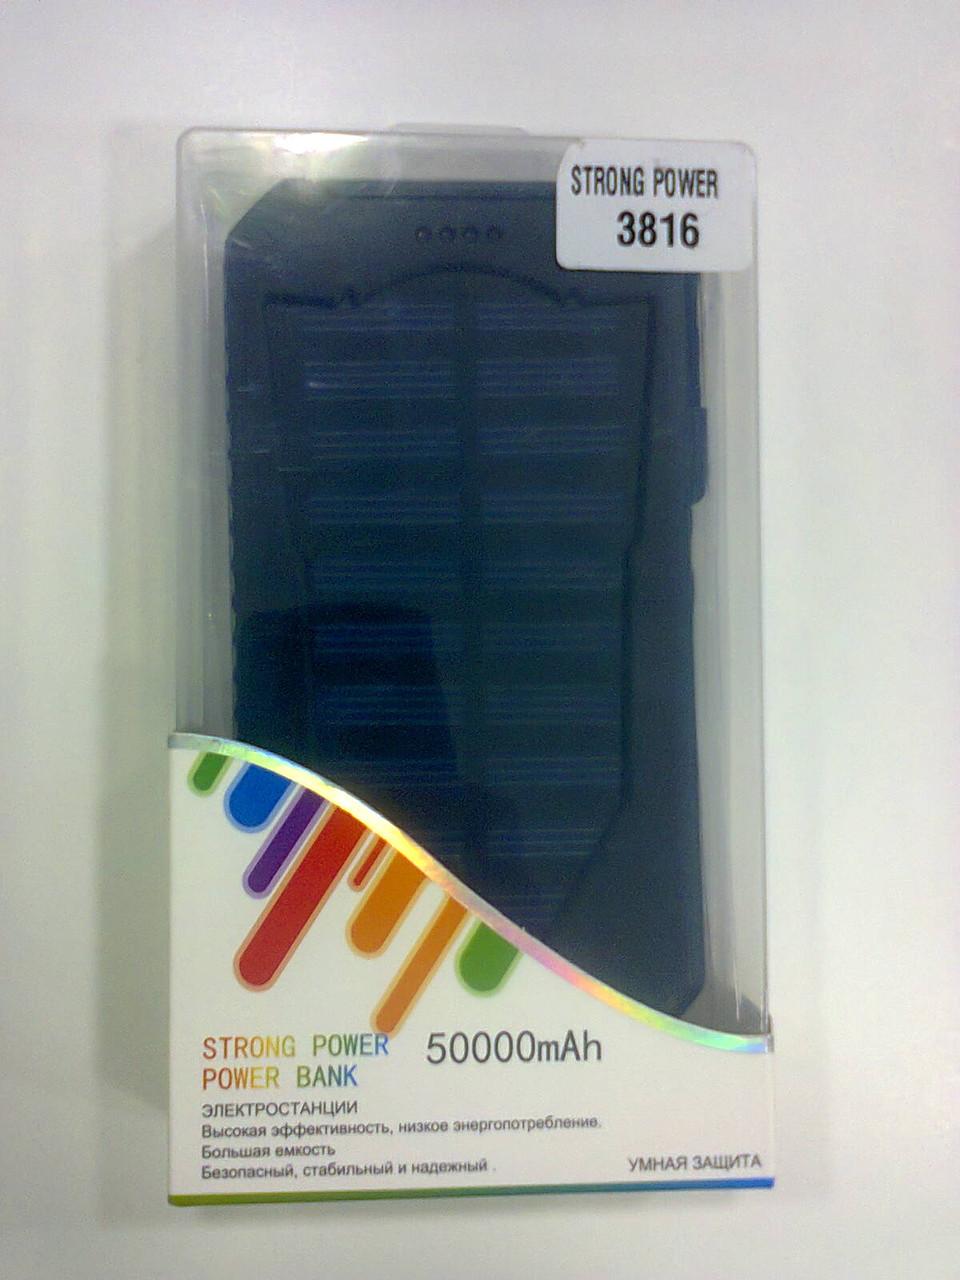 Солнечная батарея Solar Charger 50000 mAh